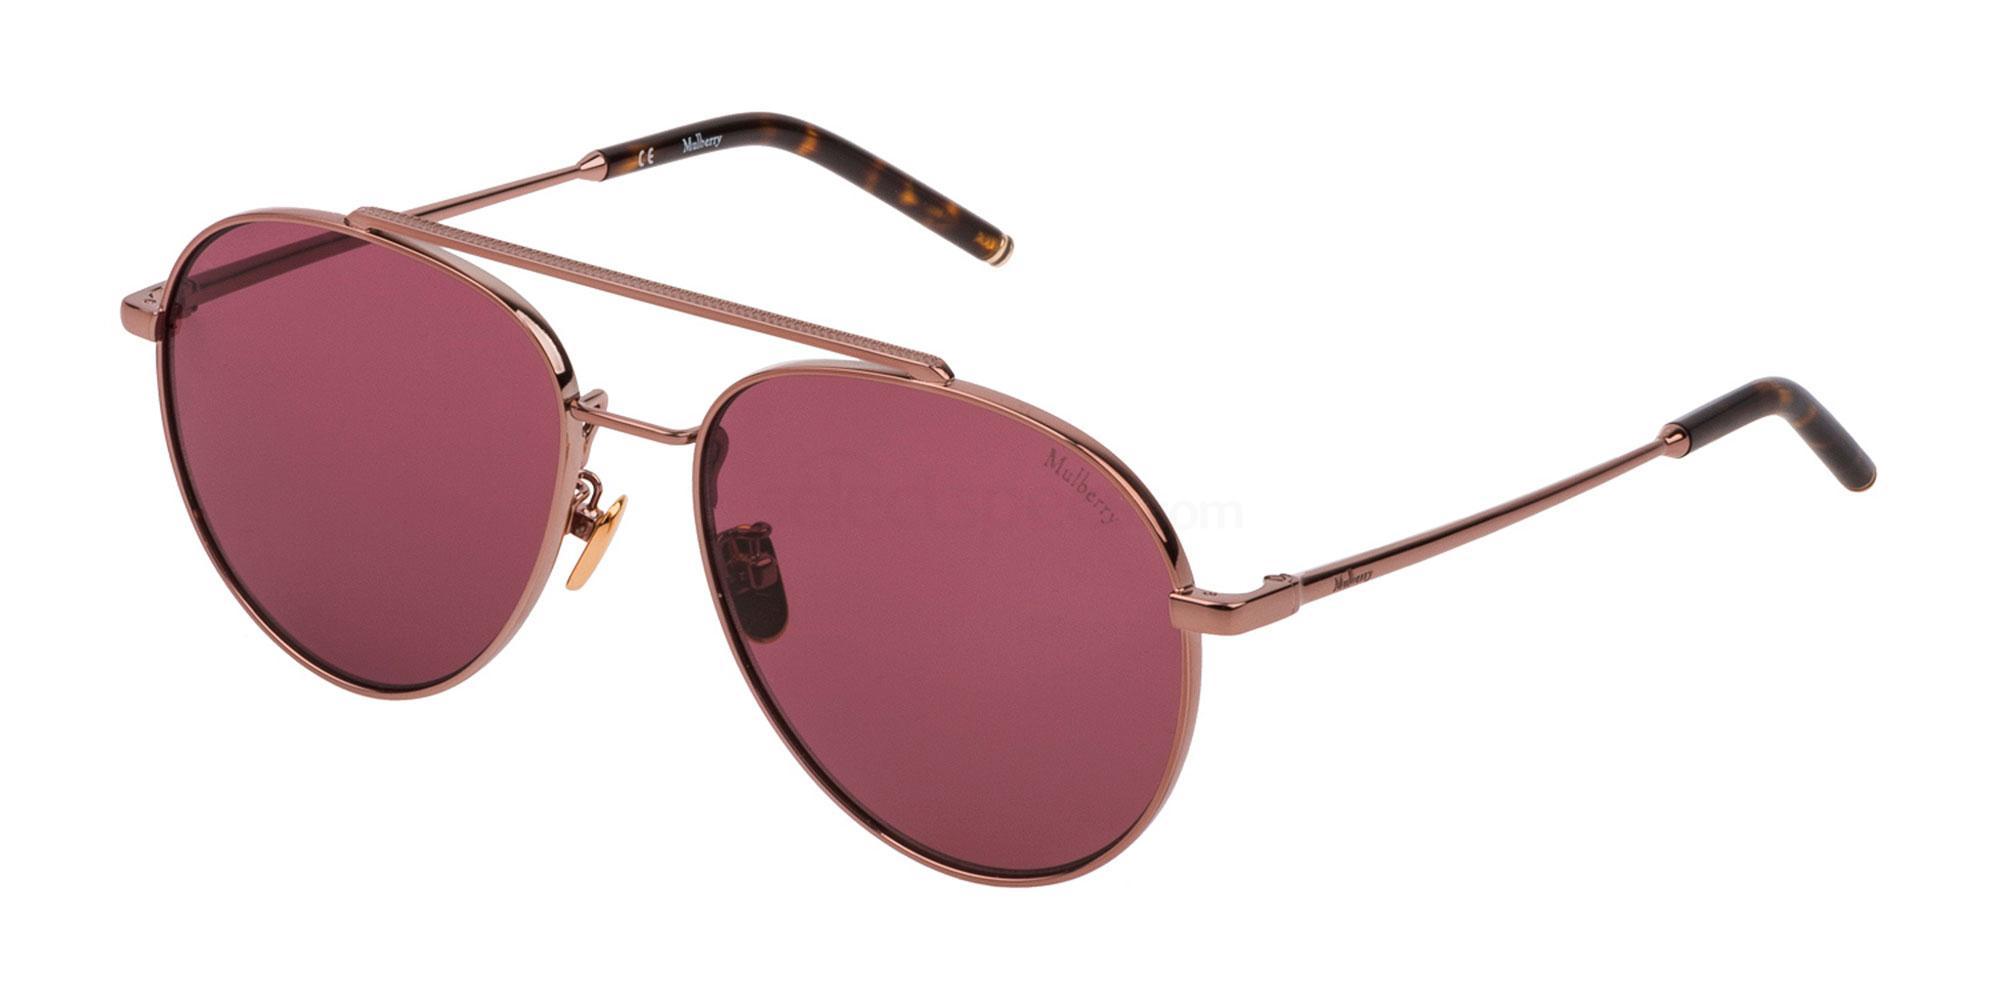 0R15 SML009 Sunglasses, Mulberry